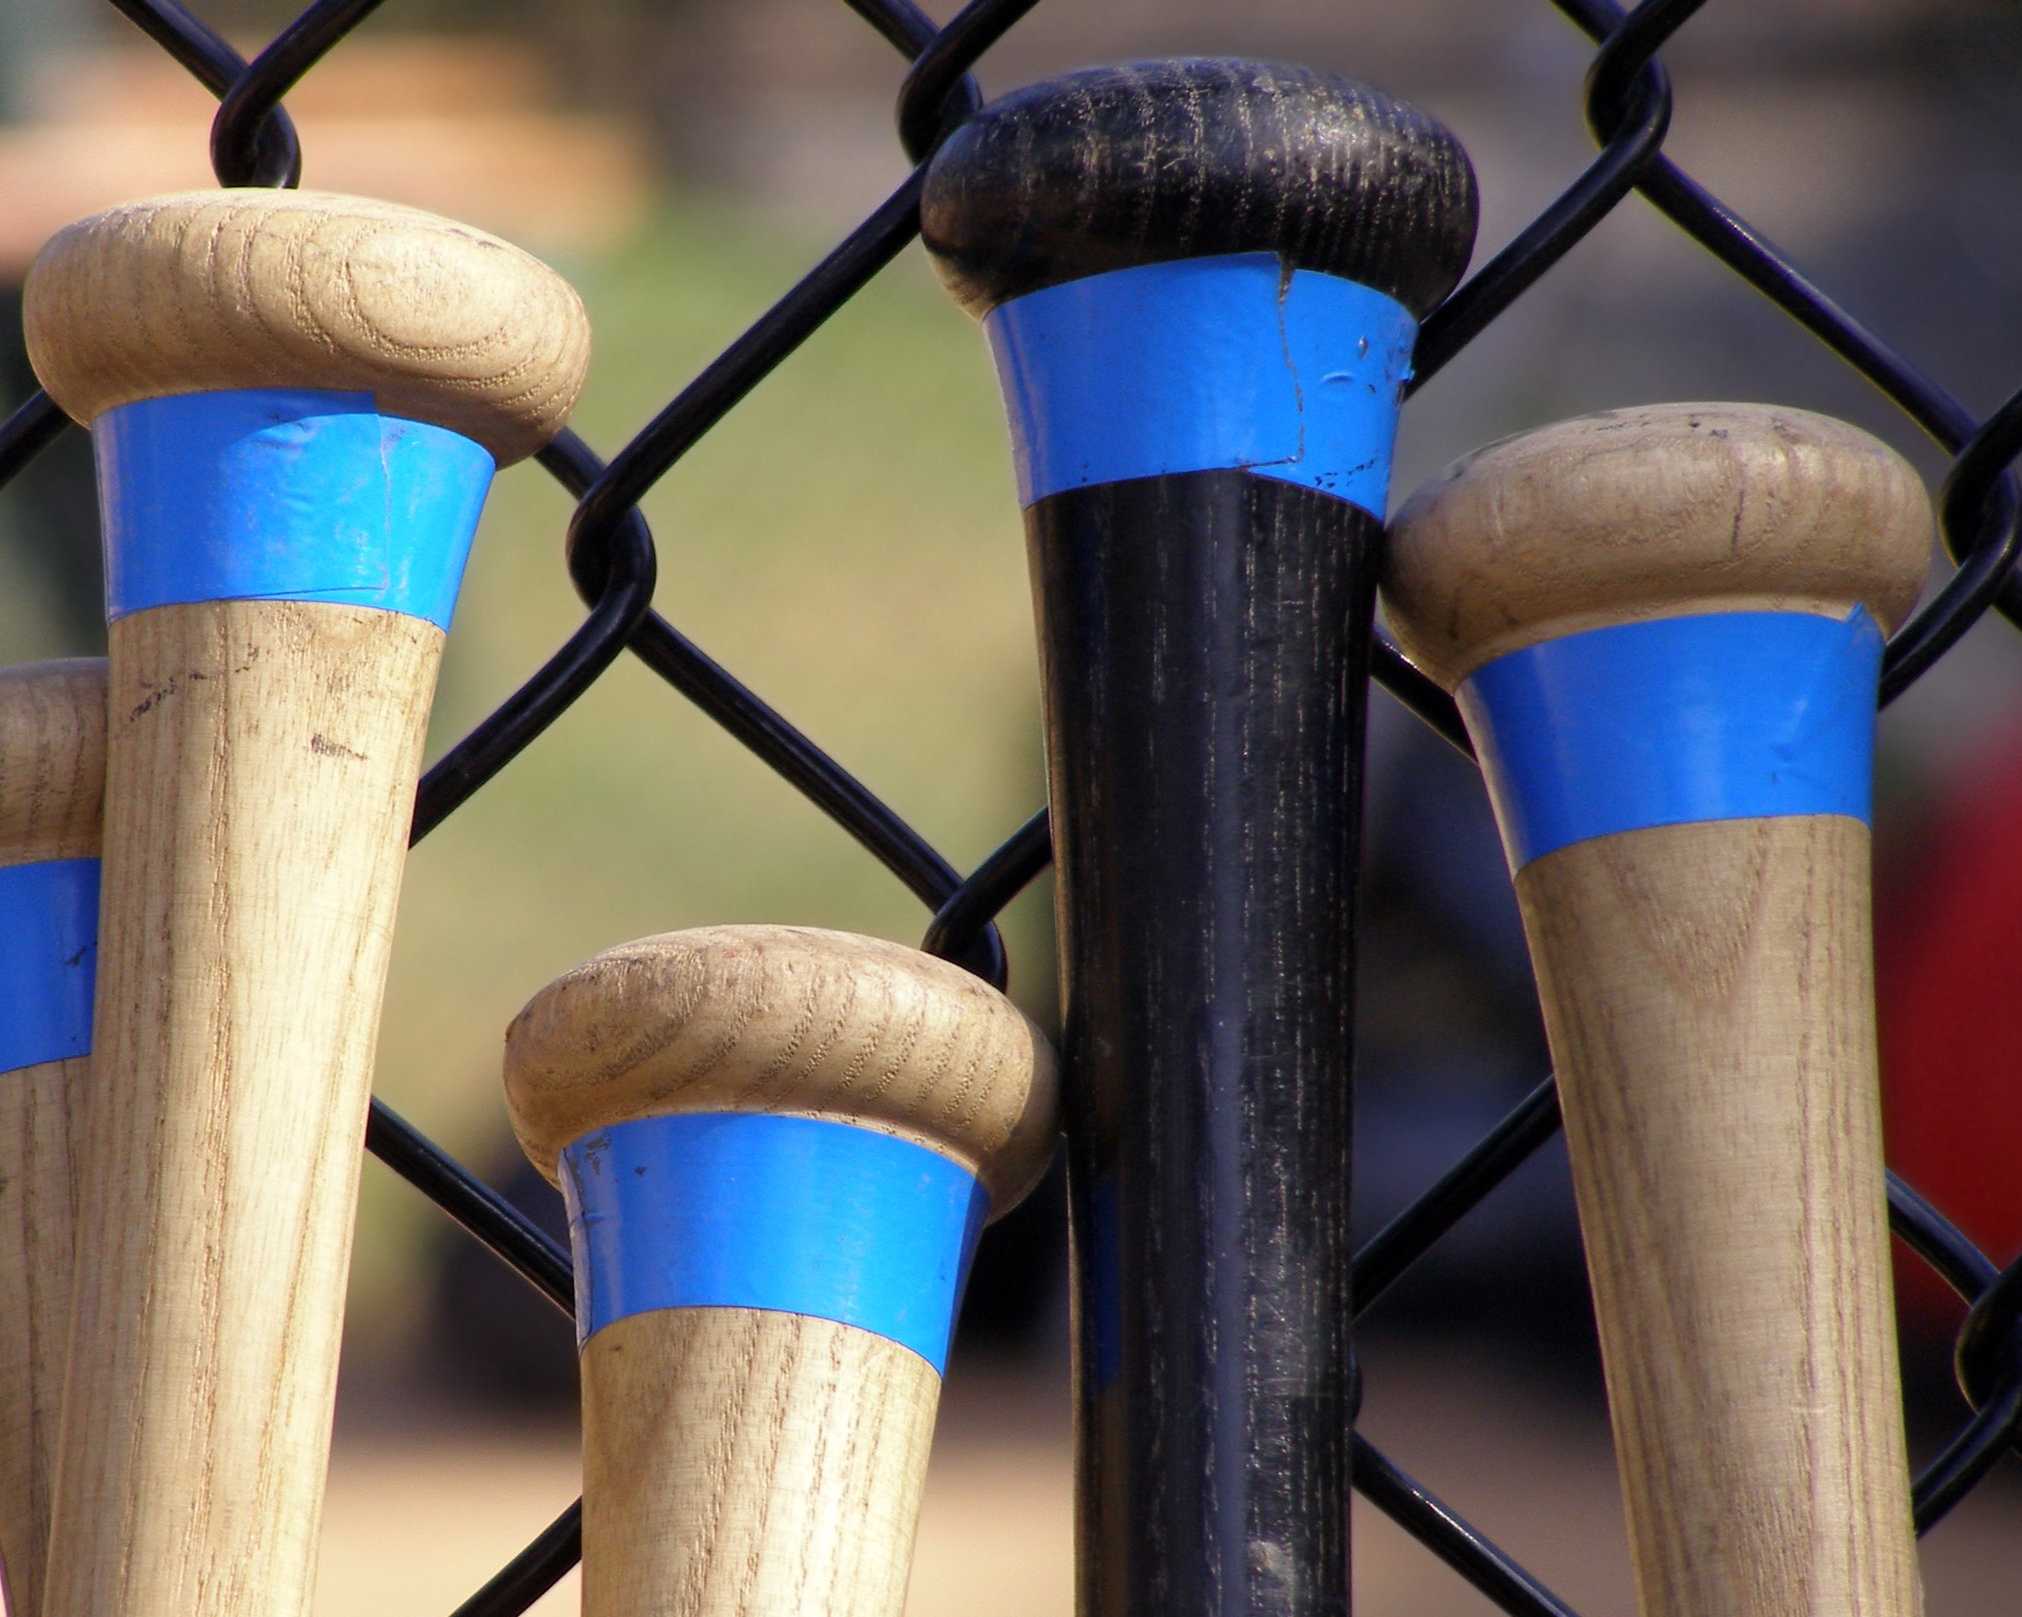 bigstock-Baseball-Bats-970794.jpg